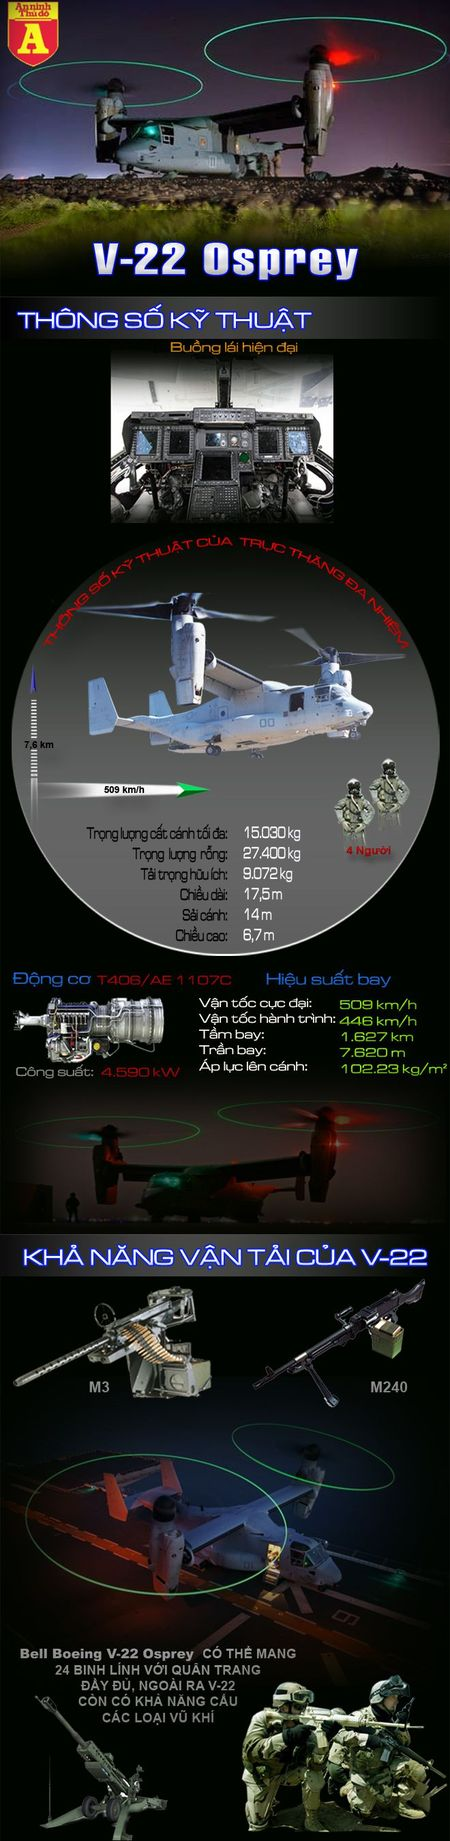 V-22 Osprey - Van tai co sieu di cua Khong luc My - Anh 2